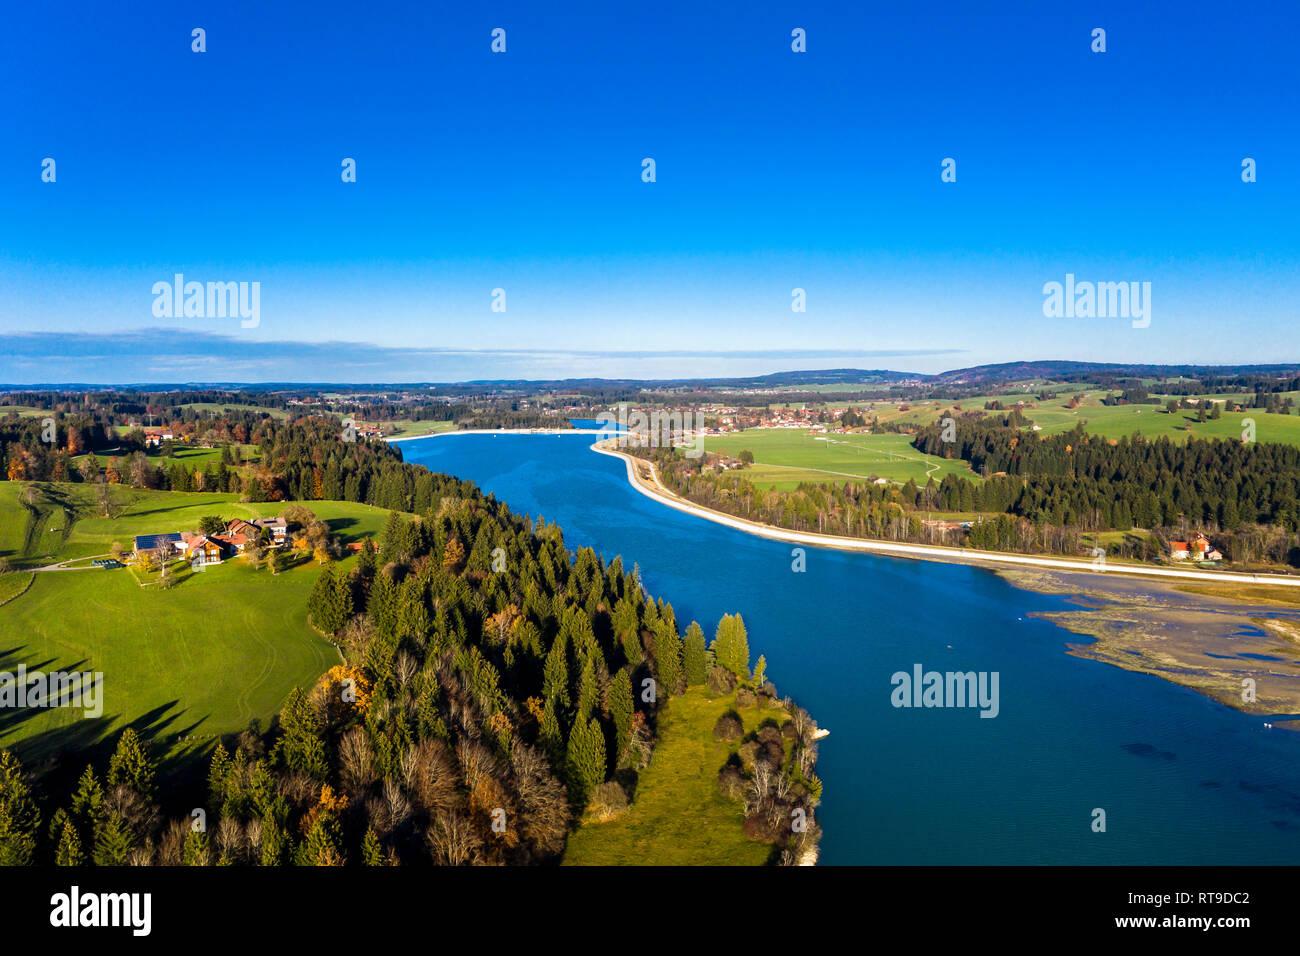 Germany, Bavaria, East Allgaeu, Fuessen, Prem, Aerial view of Lech reservoir - Stock Image